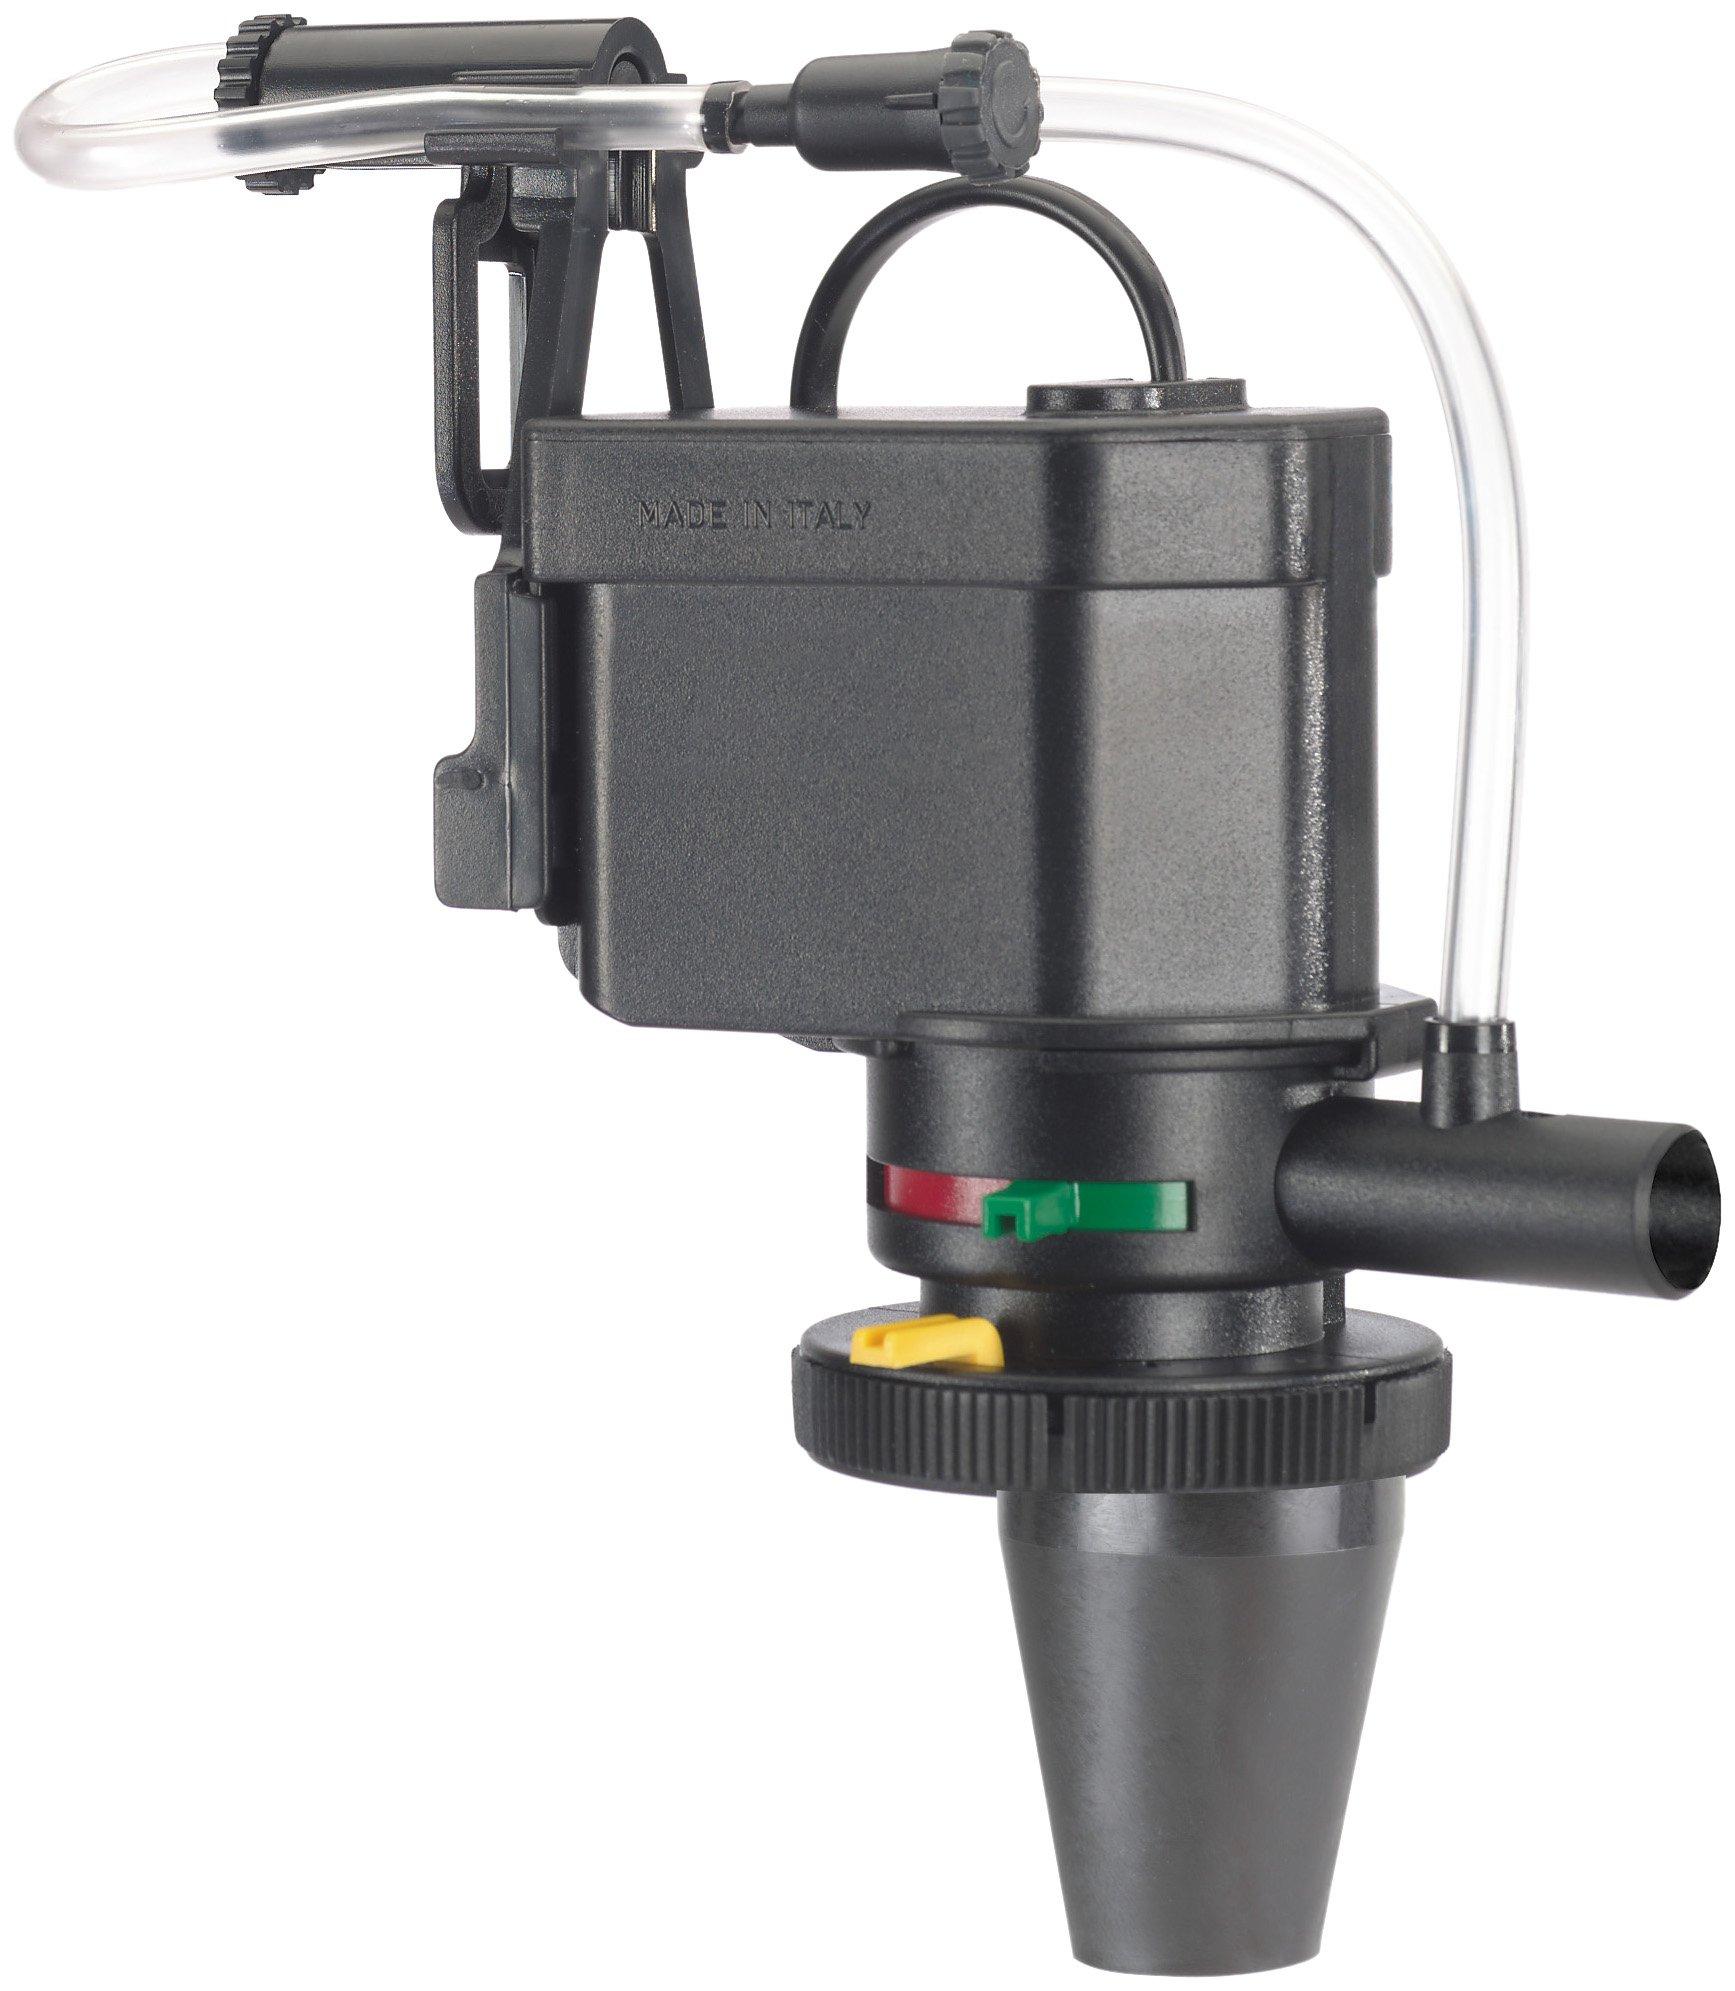 AquaClear 50 Powerhead, 270 Gallons per Hour, UL Listed by Aqua Clear